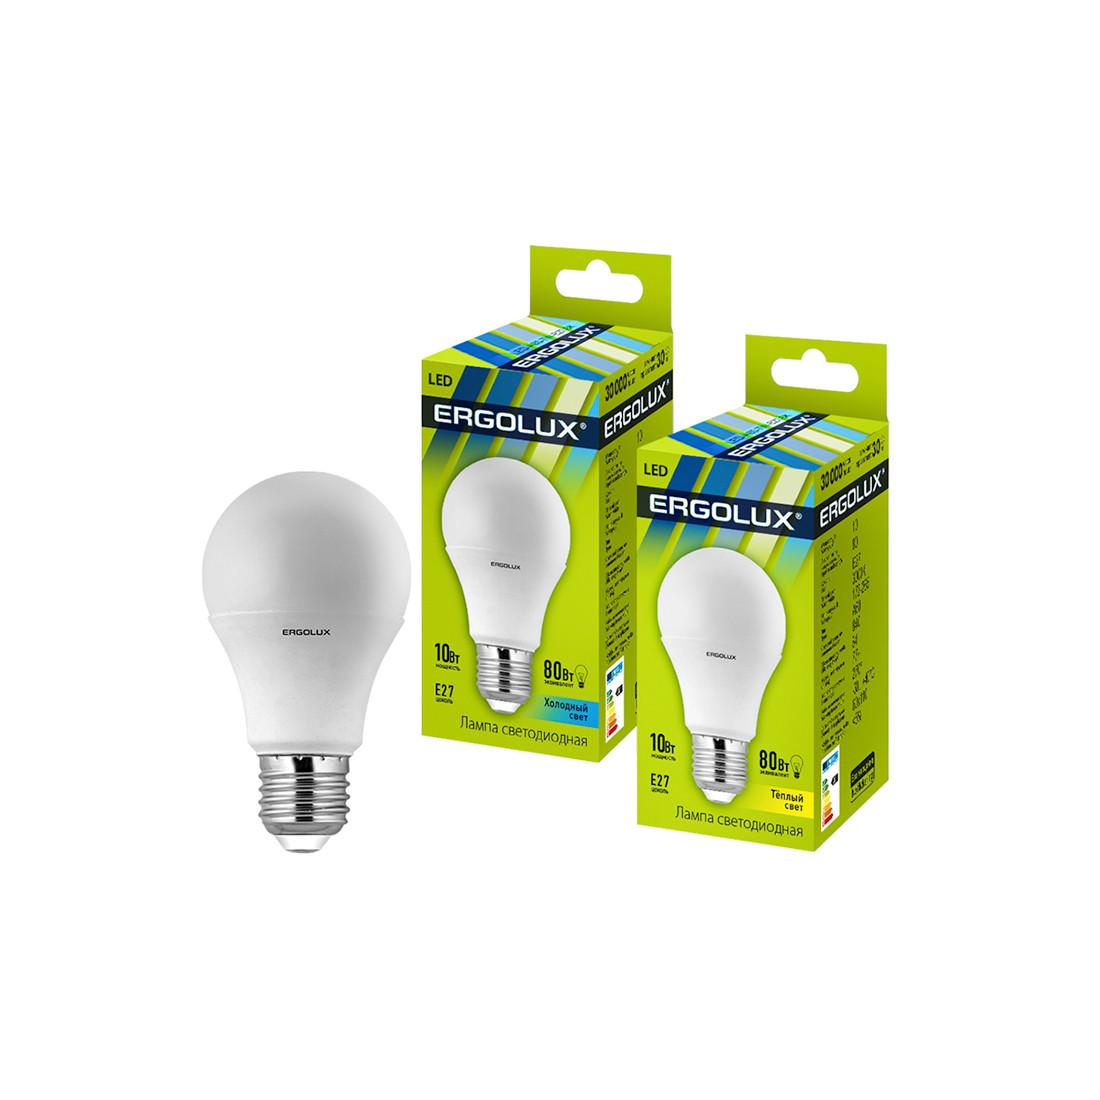 Эл. лампа светодиодная Ergolux LED-A60-10W-E27-3K (10Вт, Тип колбы A60)